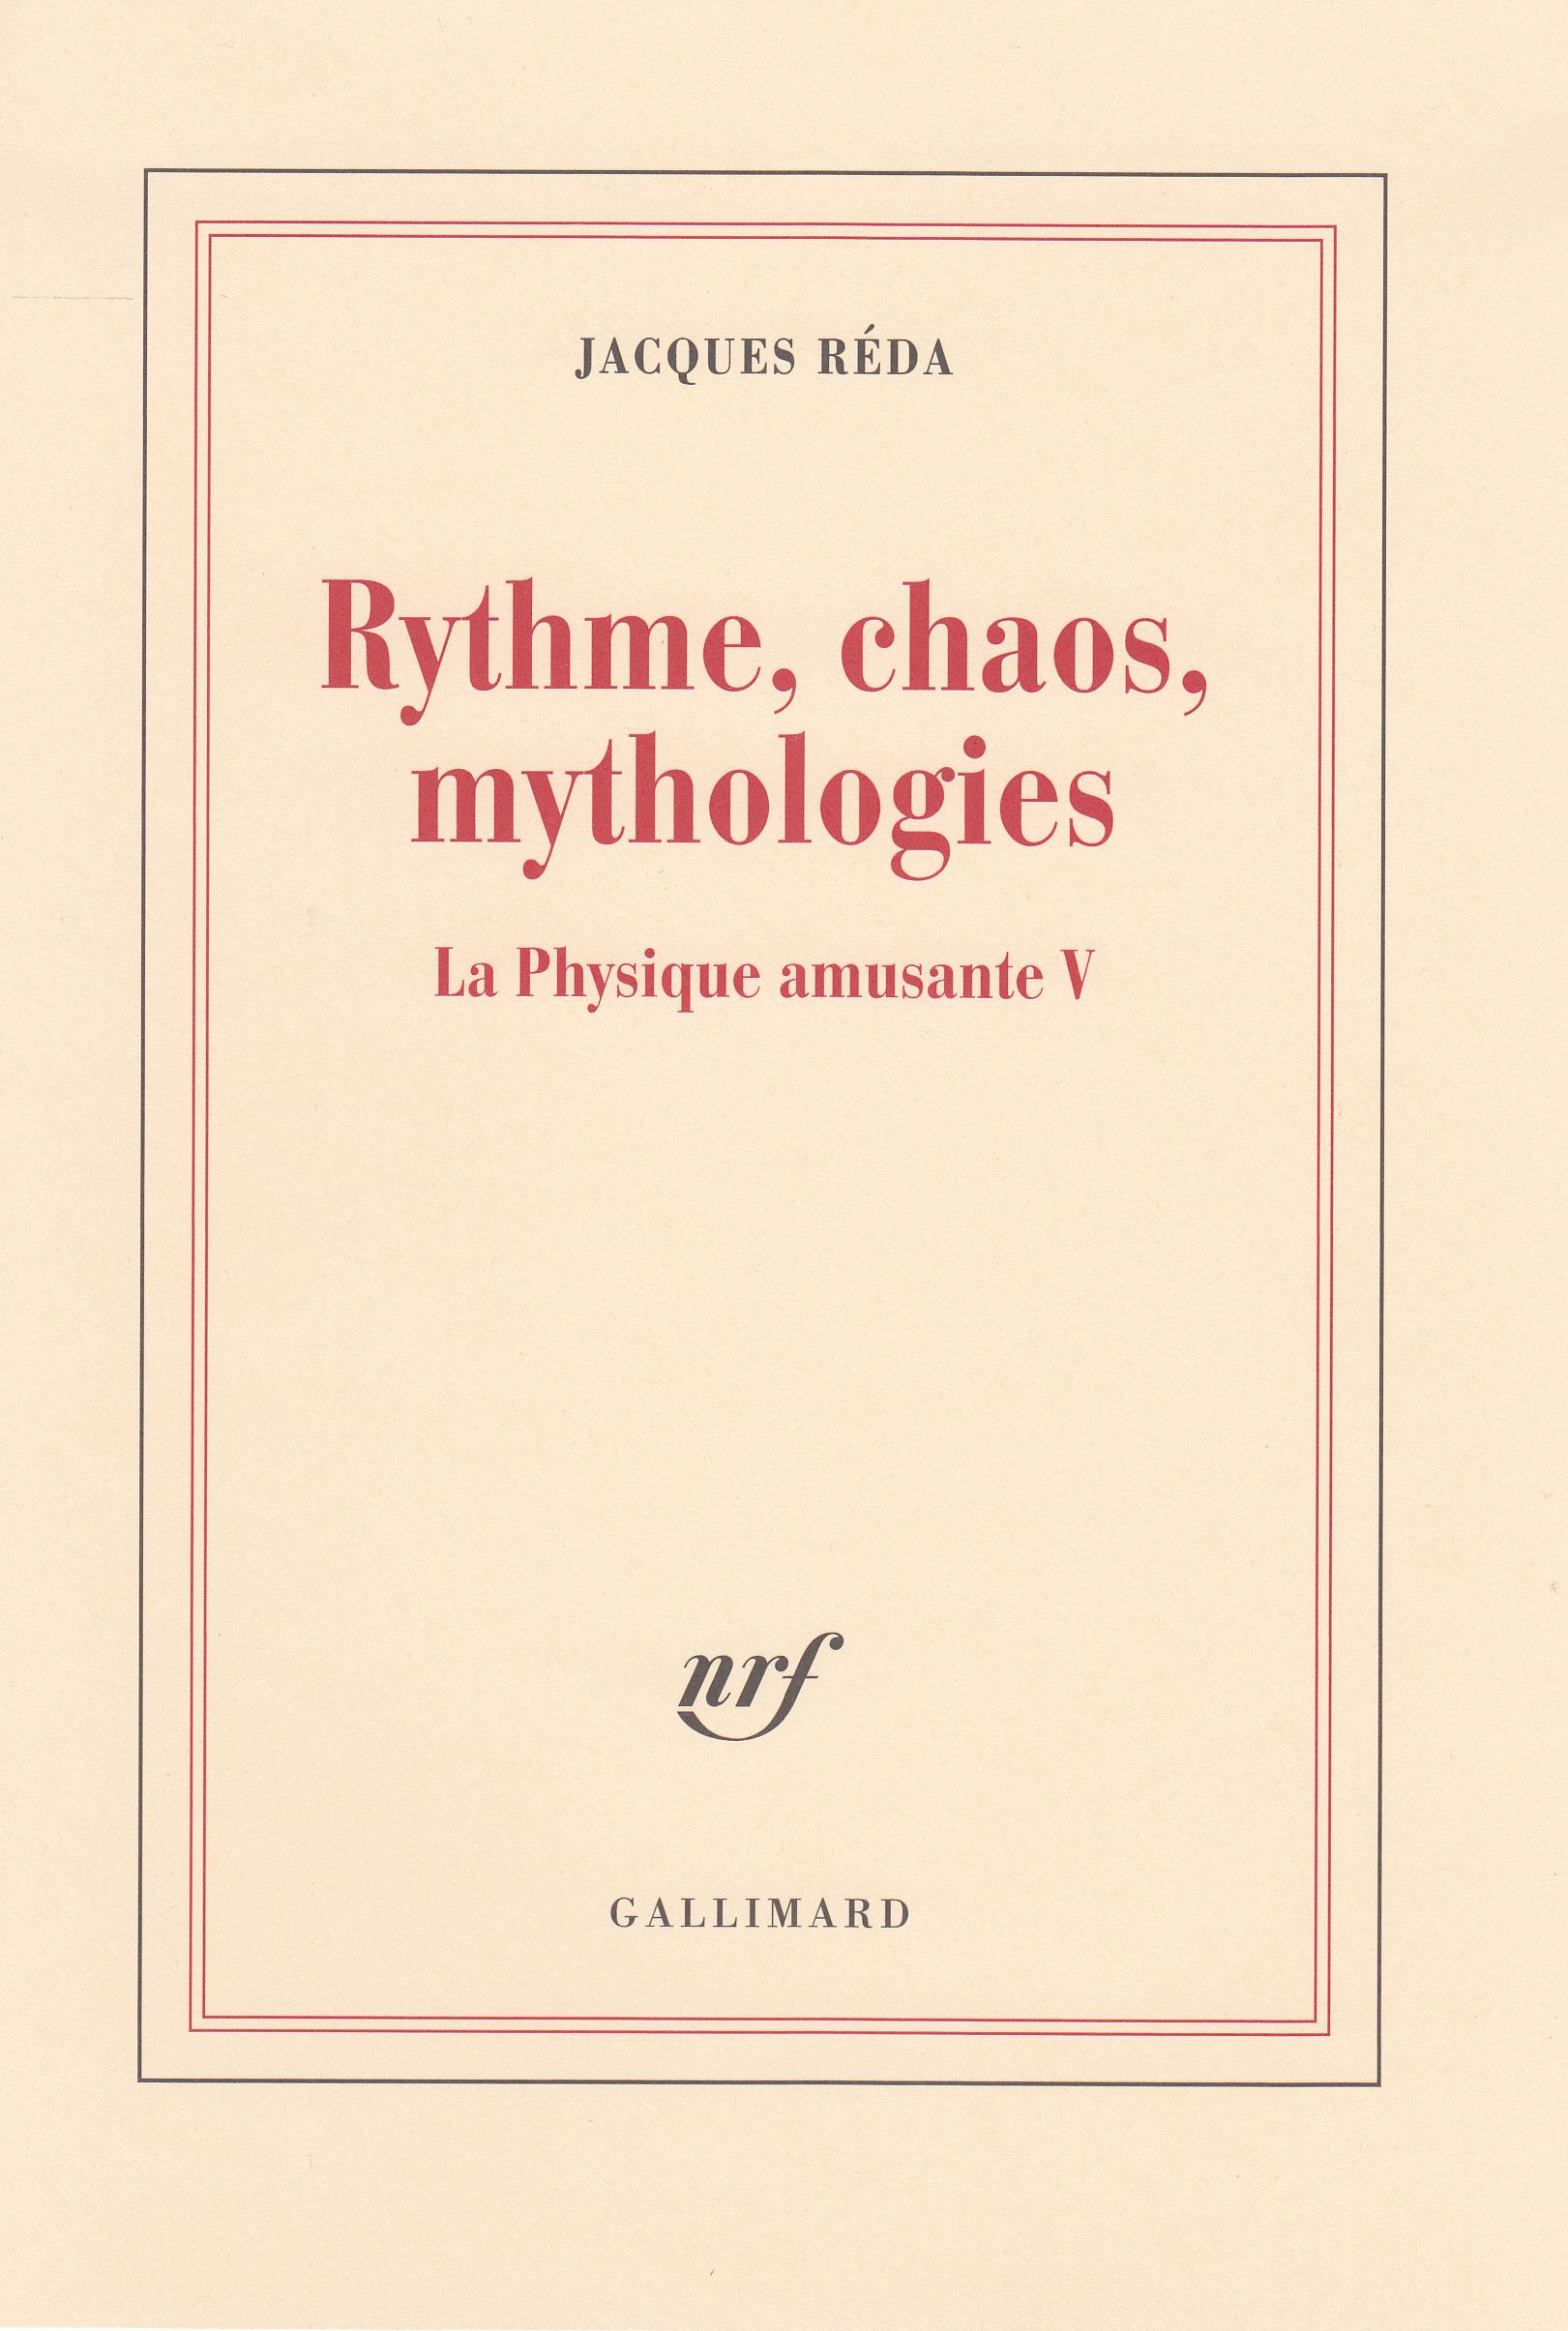 LA PHYSIQUE AMUSANTE, V : RYTHME, CHAOS, MYTHOLOGIES - LA PHYSIQUE AMUSANTE V